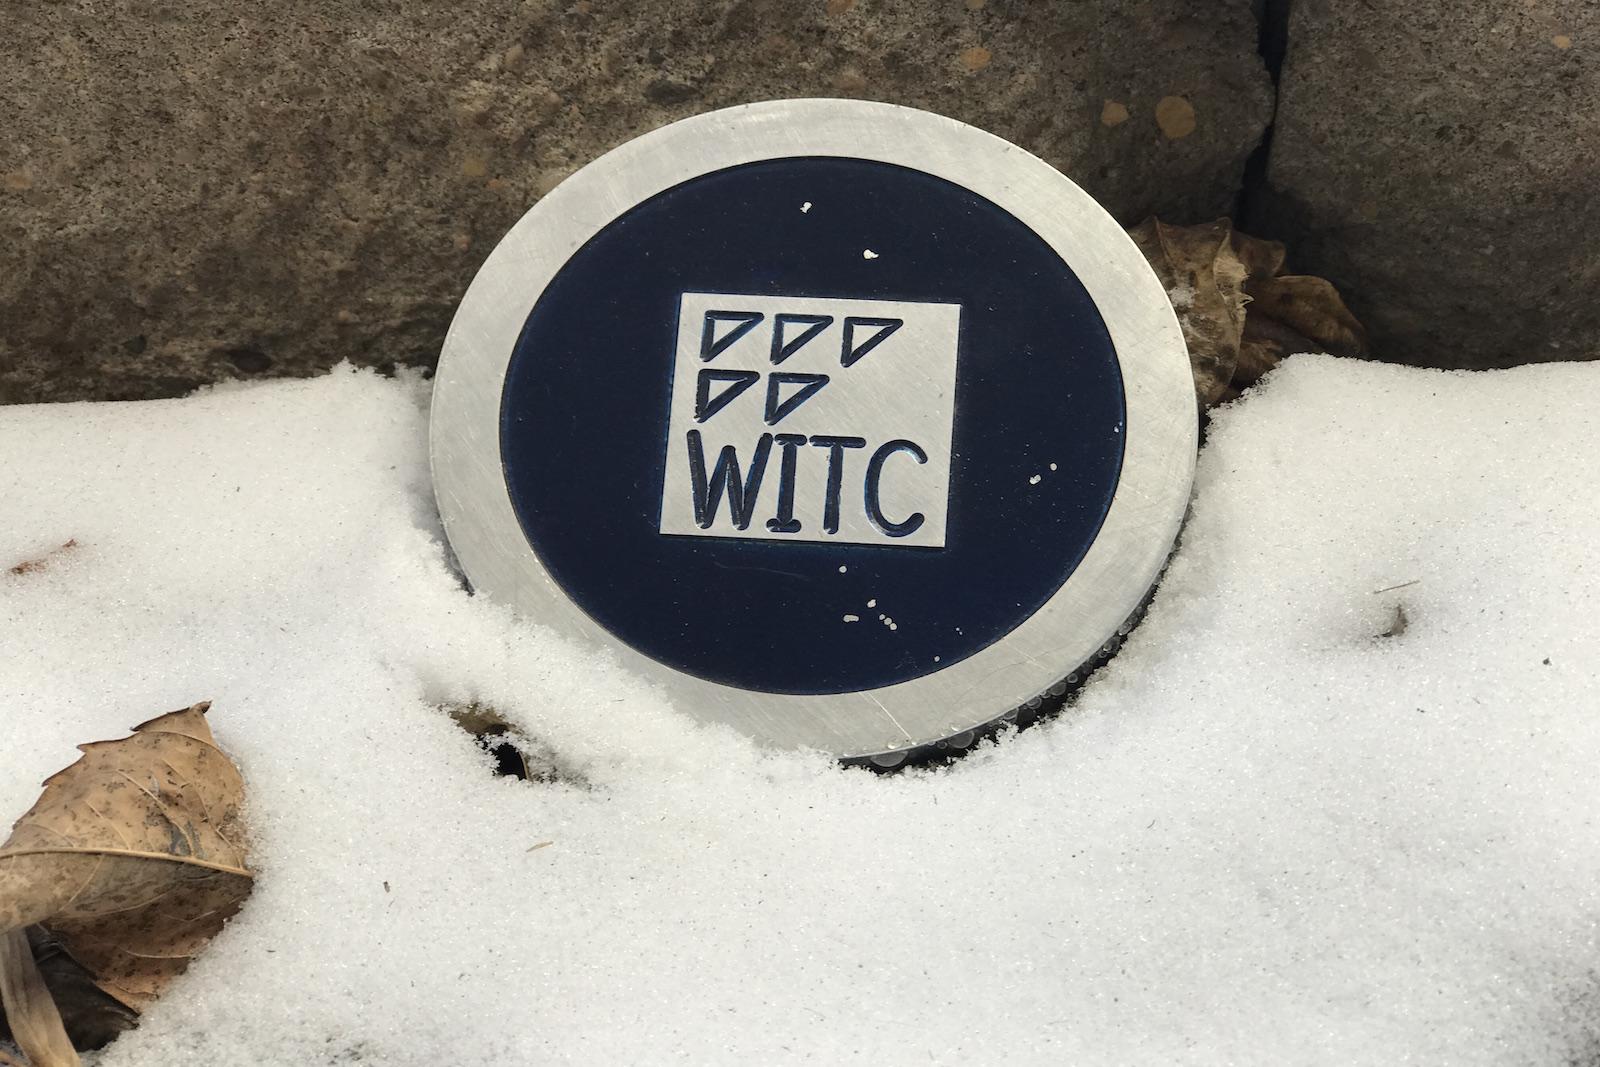 Jessica Hehir/WITC